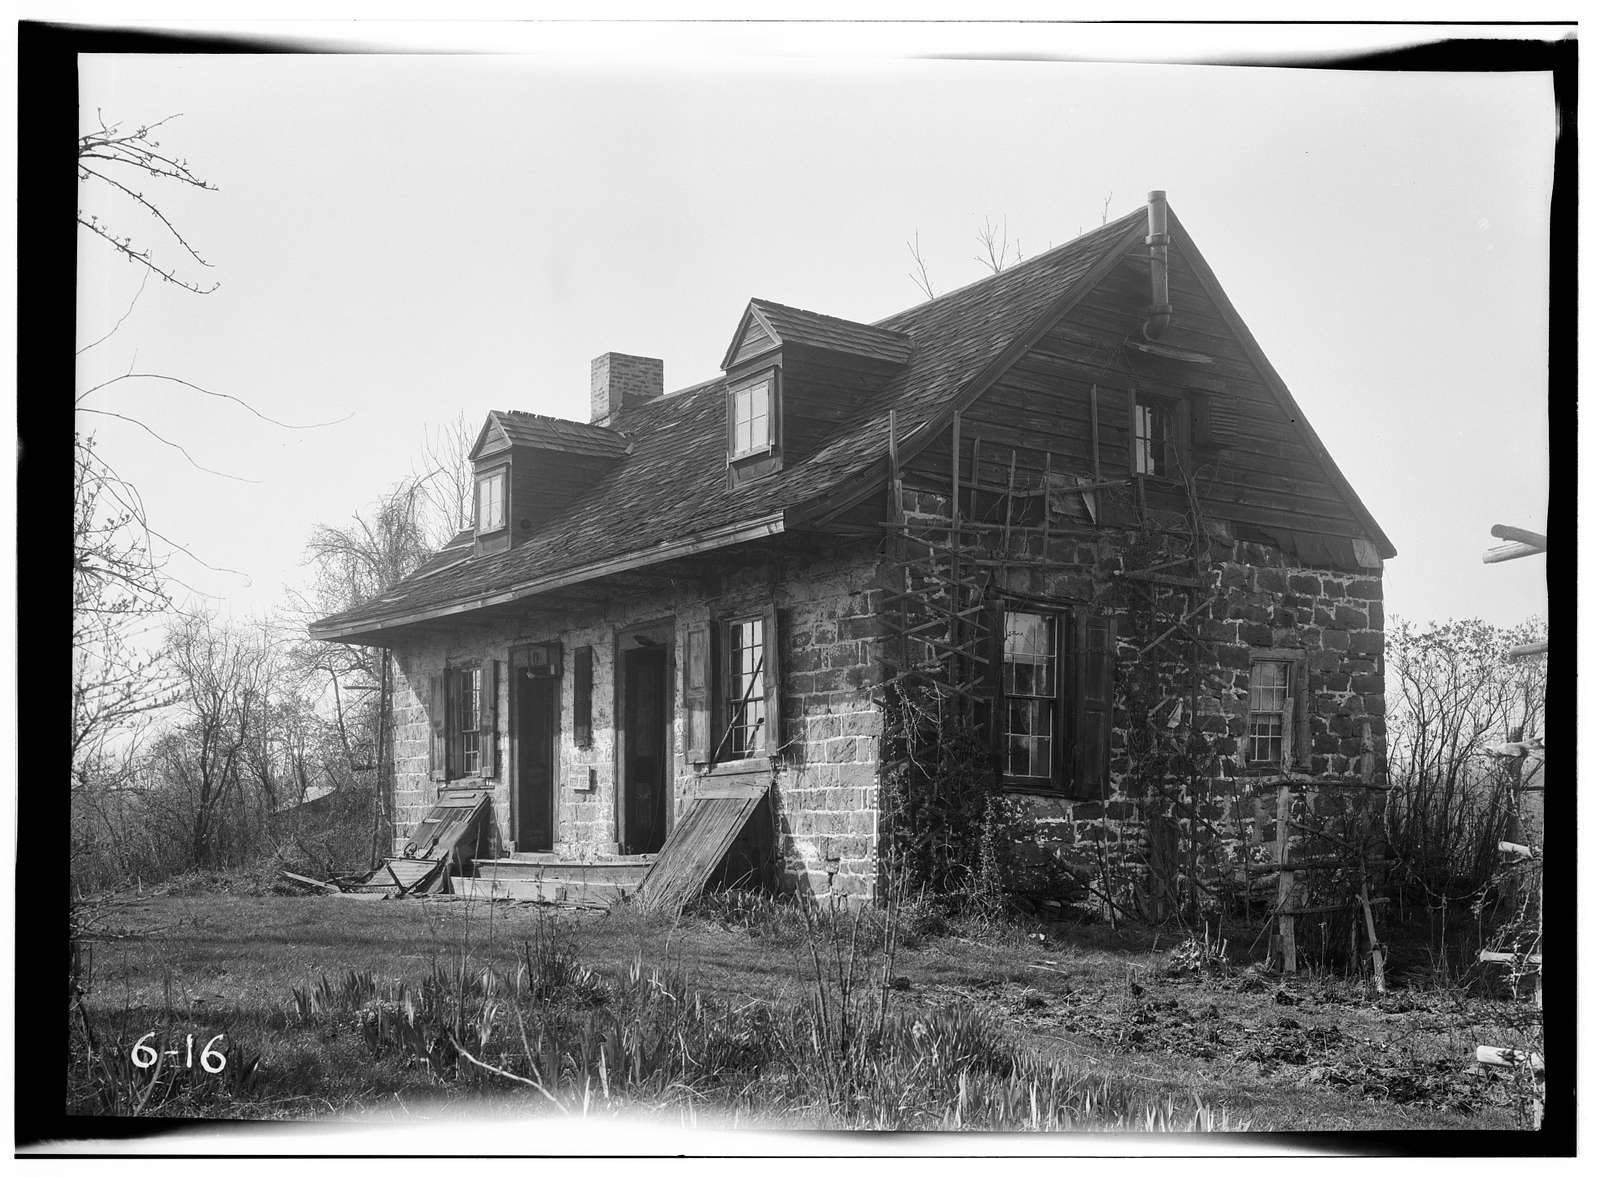 Samuel des Marest House, River Road, New Milford, Bergen County, NJ